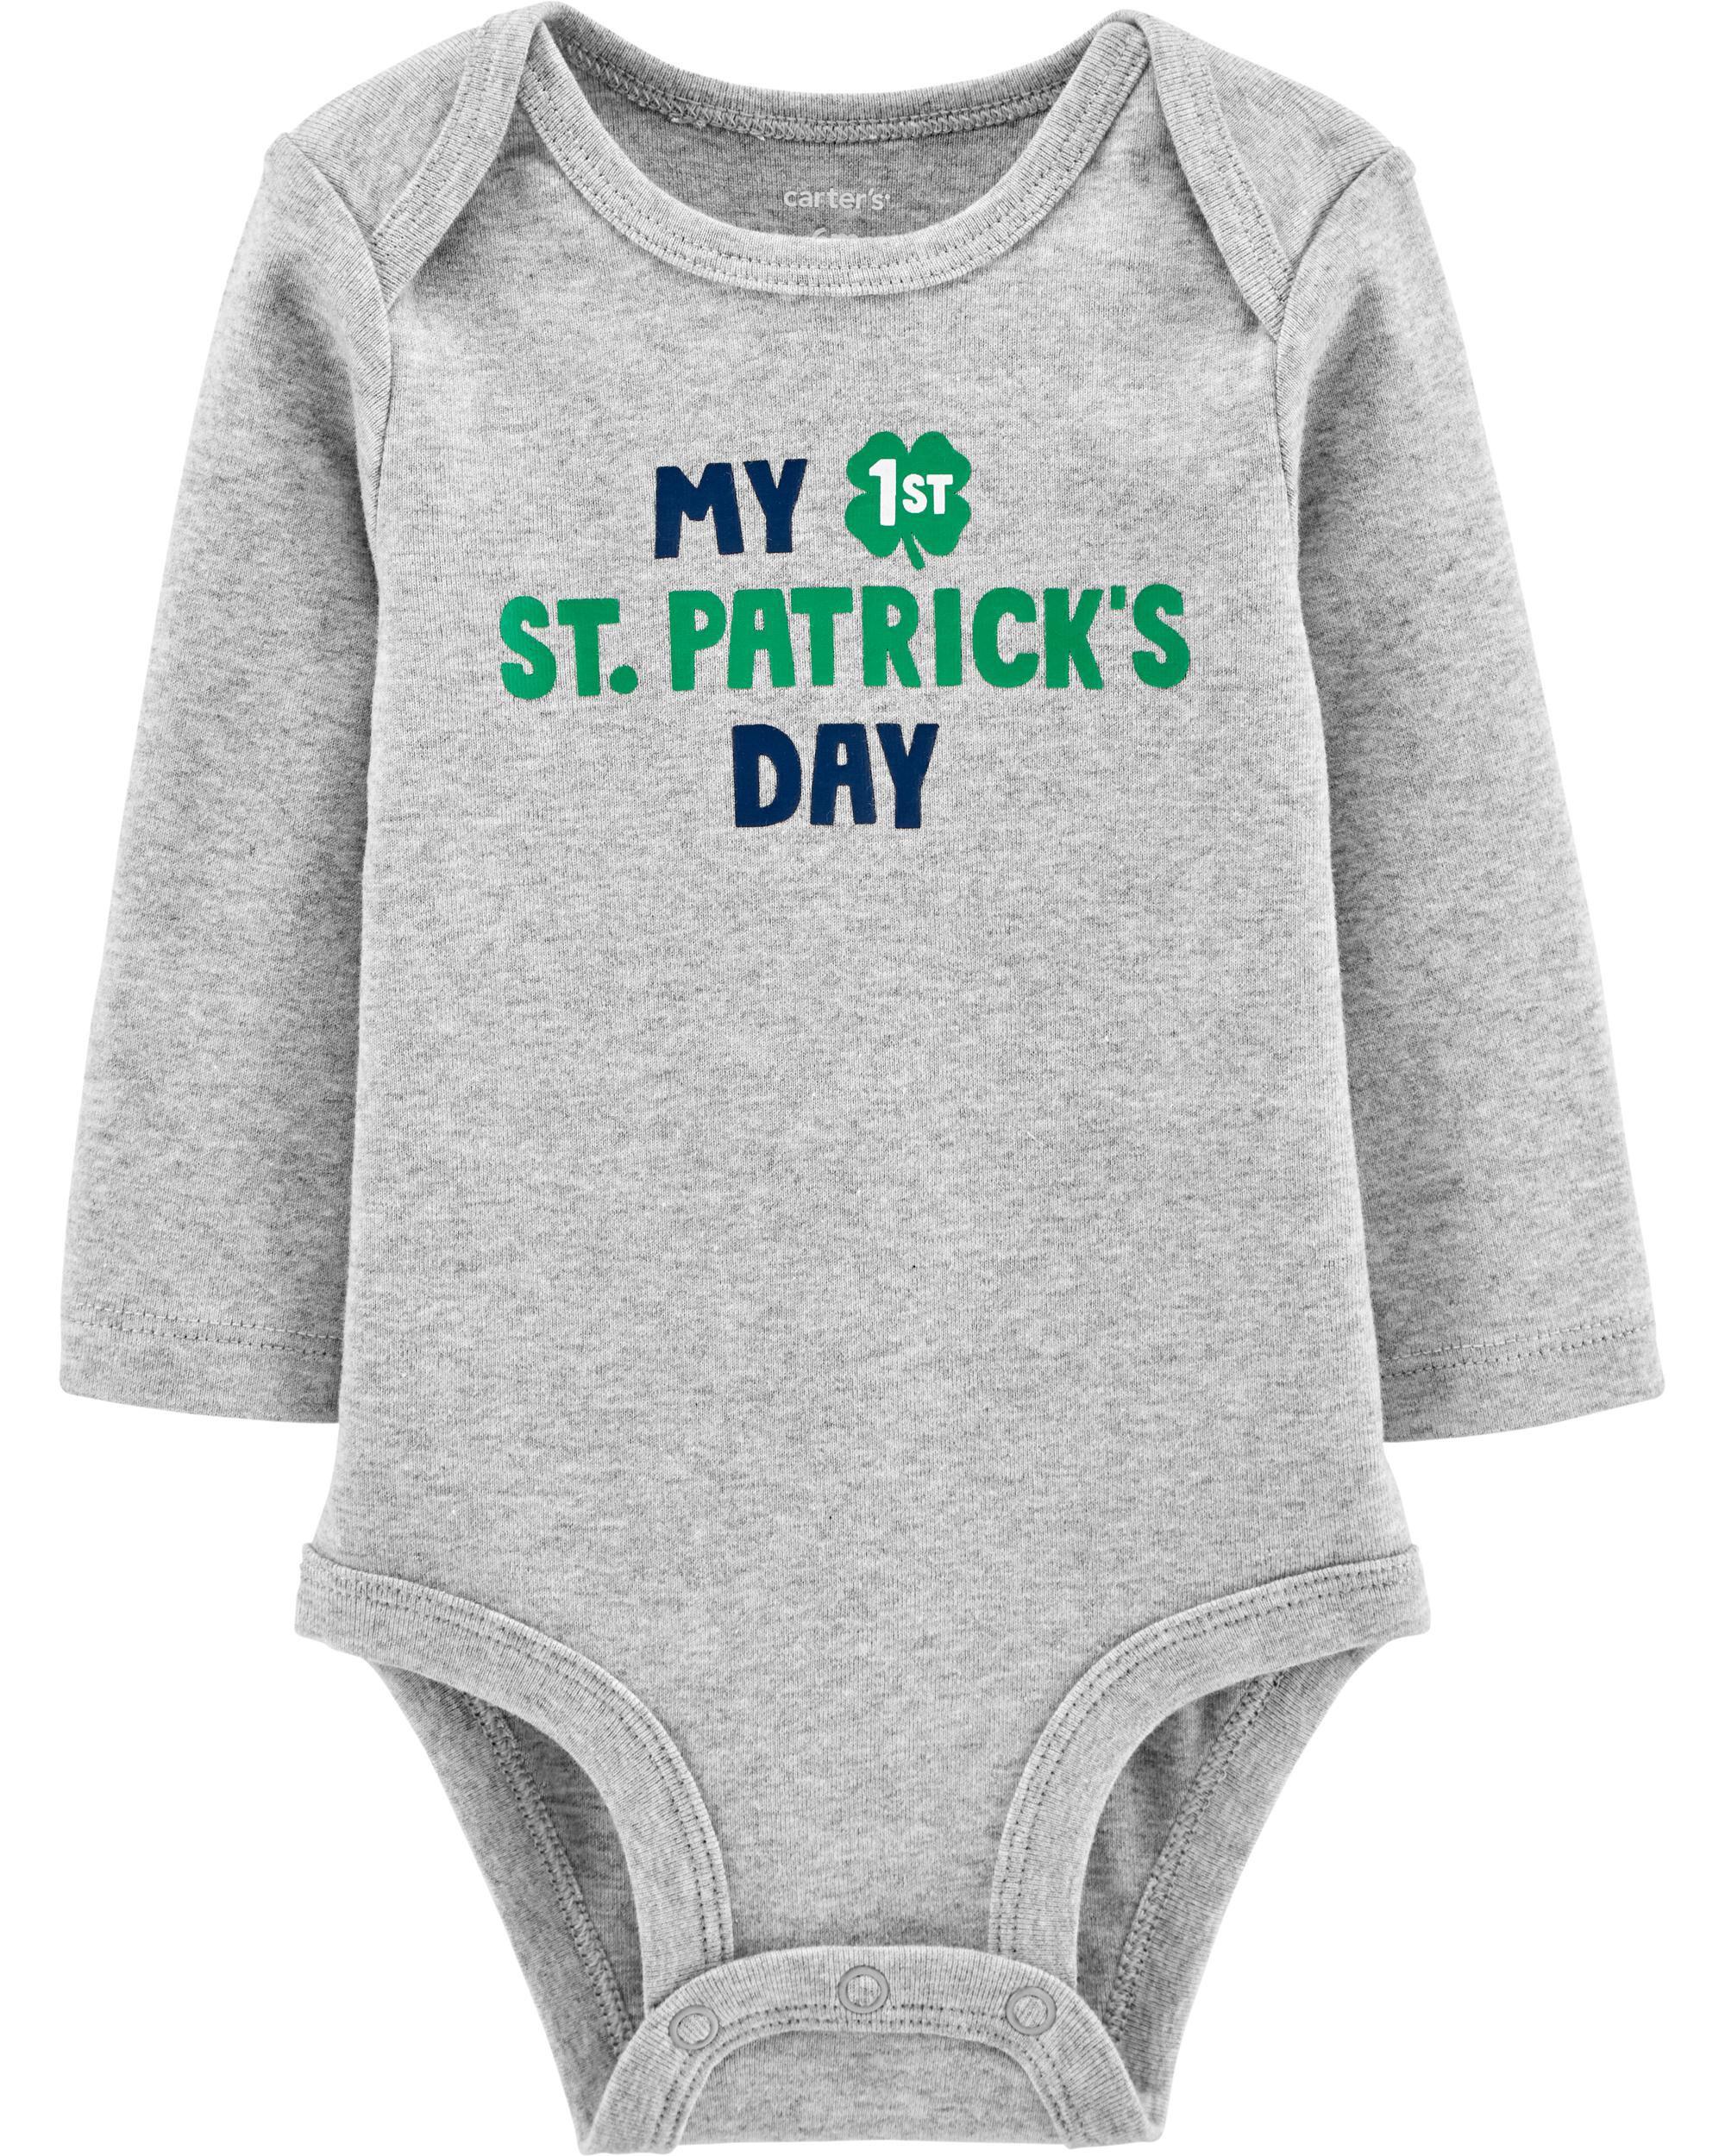 Paddy/'s Patrick/'s Day Size Newborn Bodysuit Carters Baby Boy My 1st First St